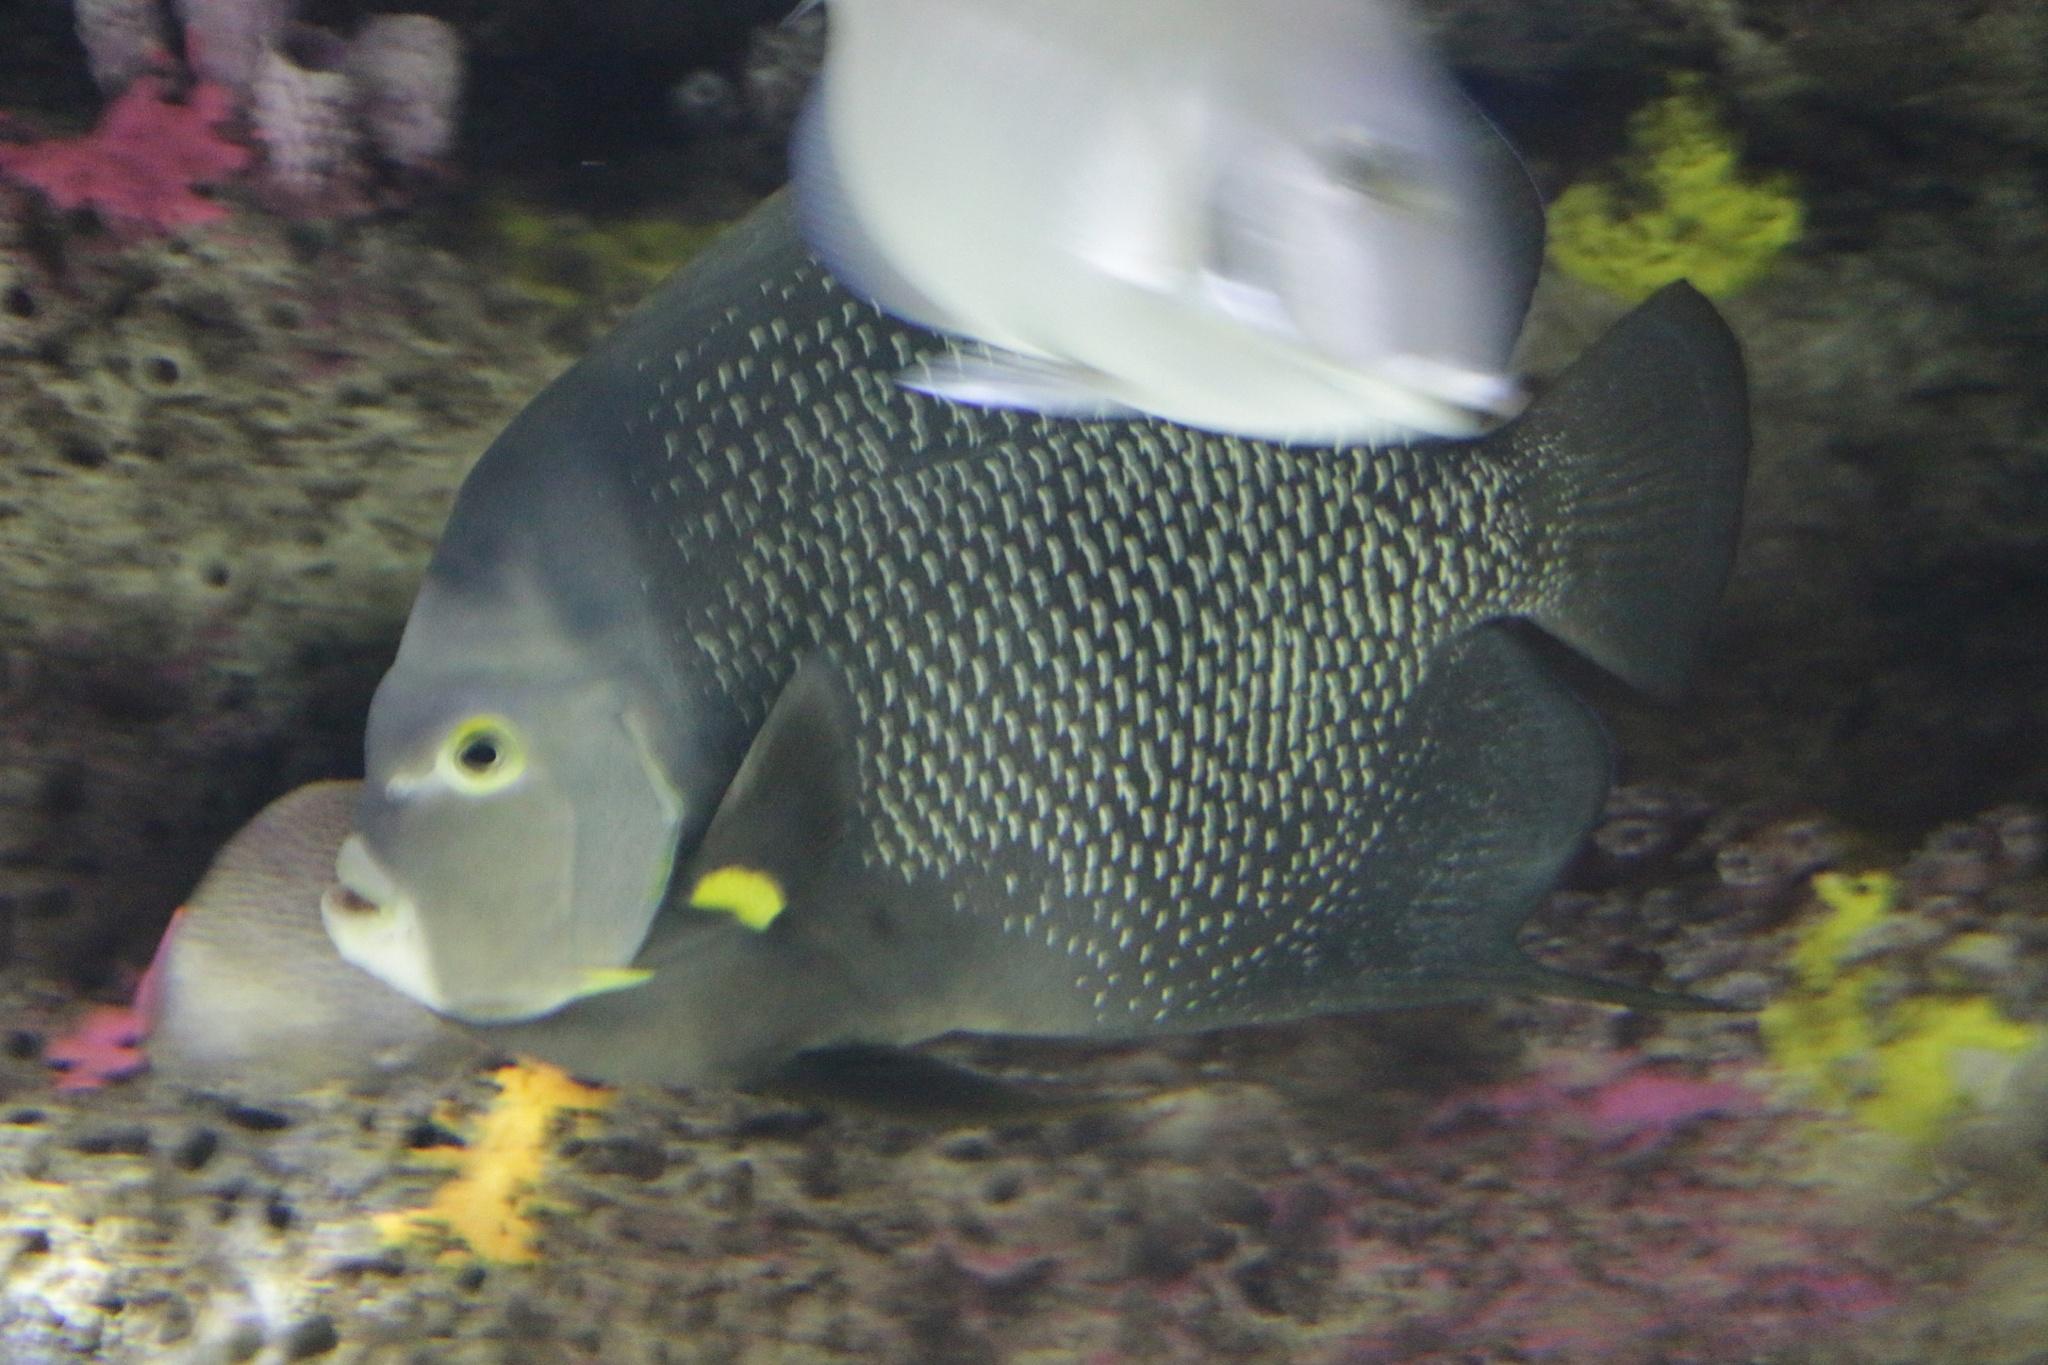 Fish of the deep by DAVatalaro